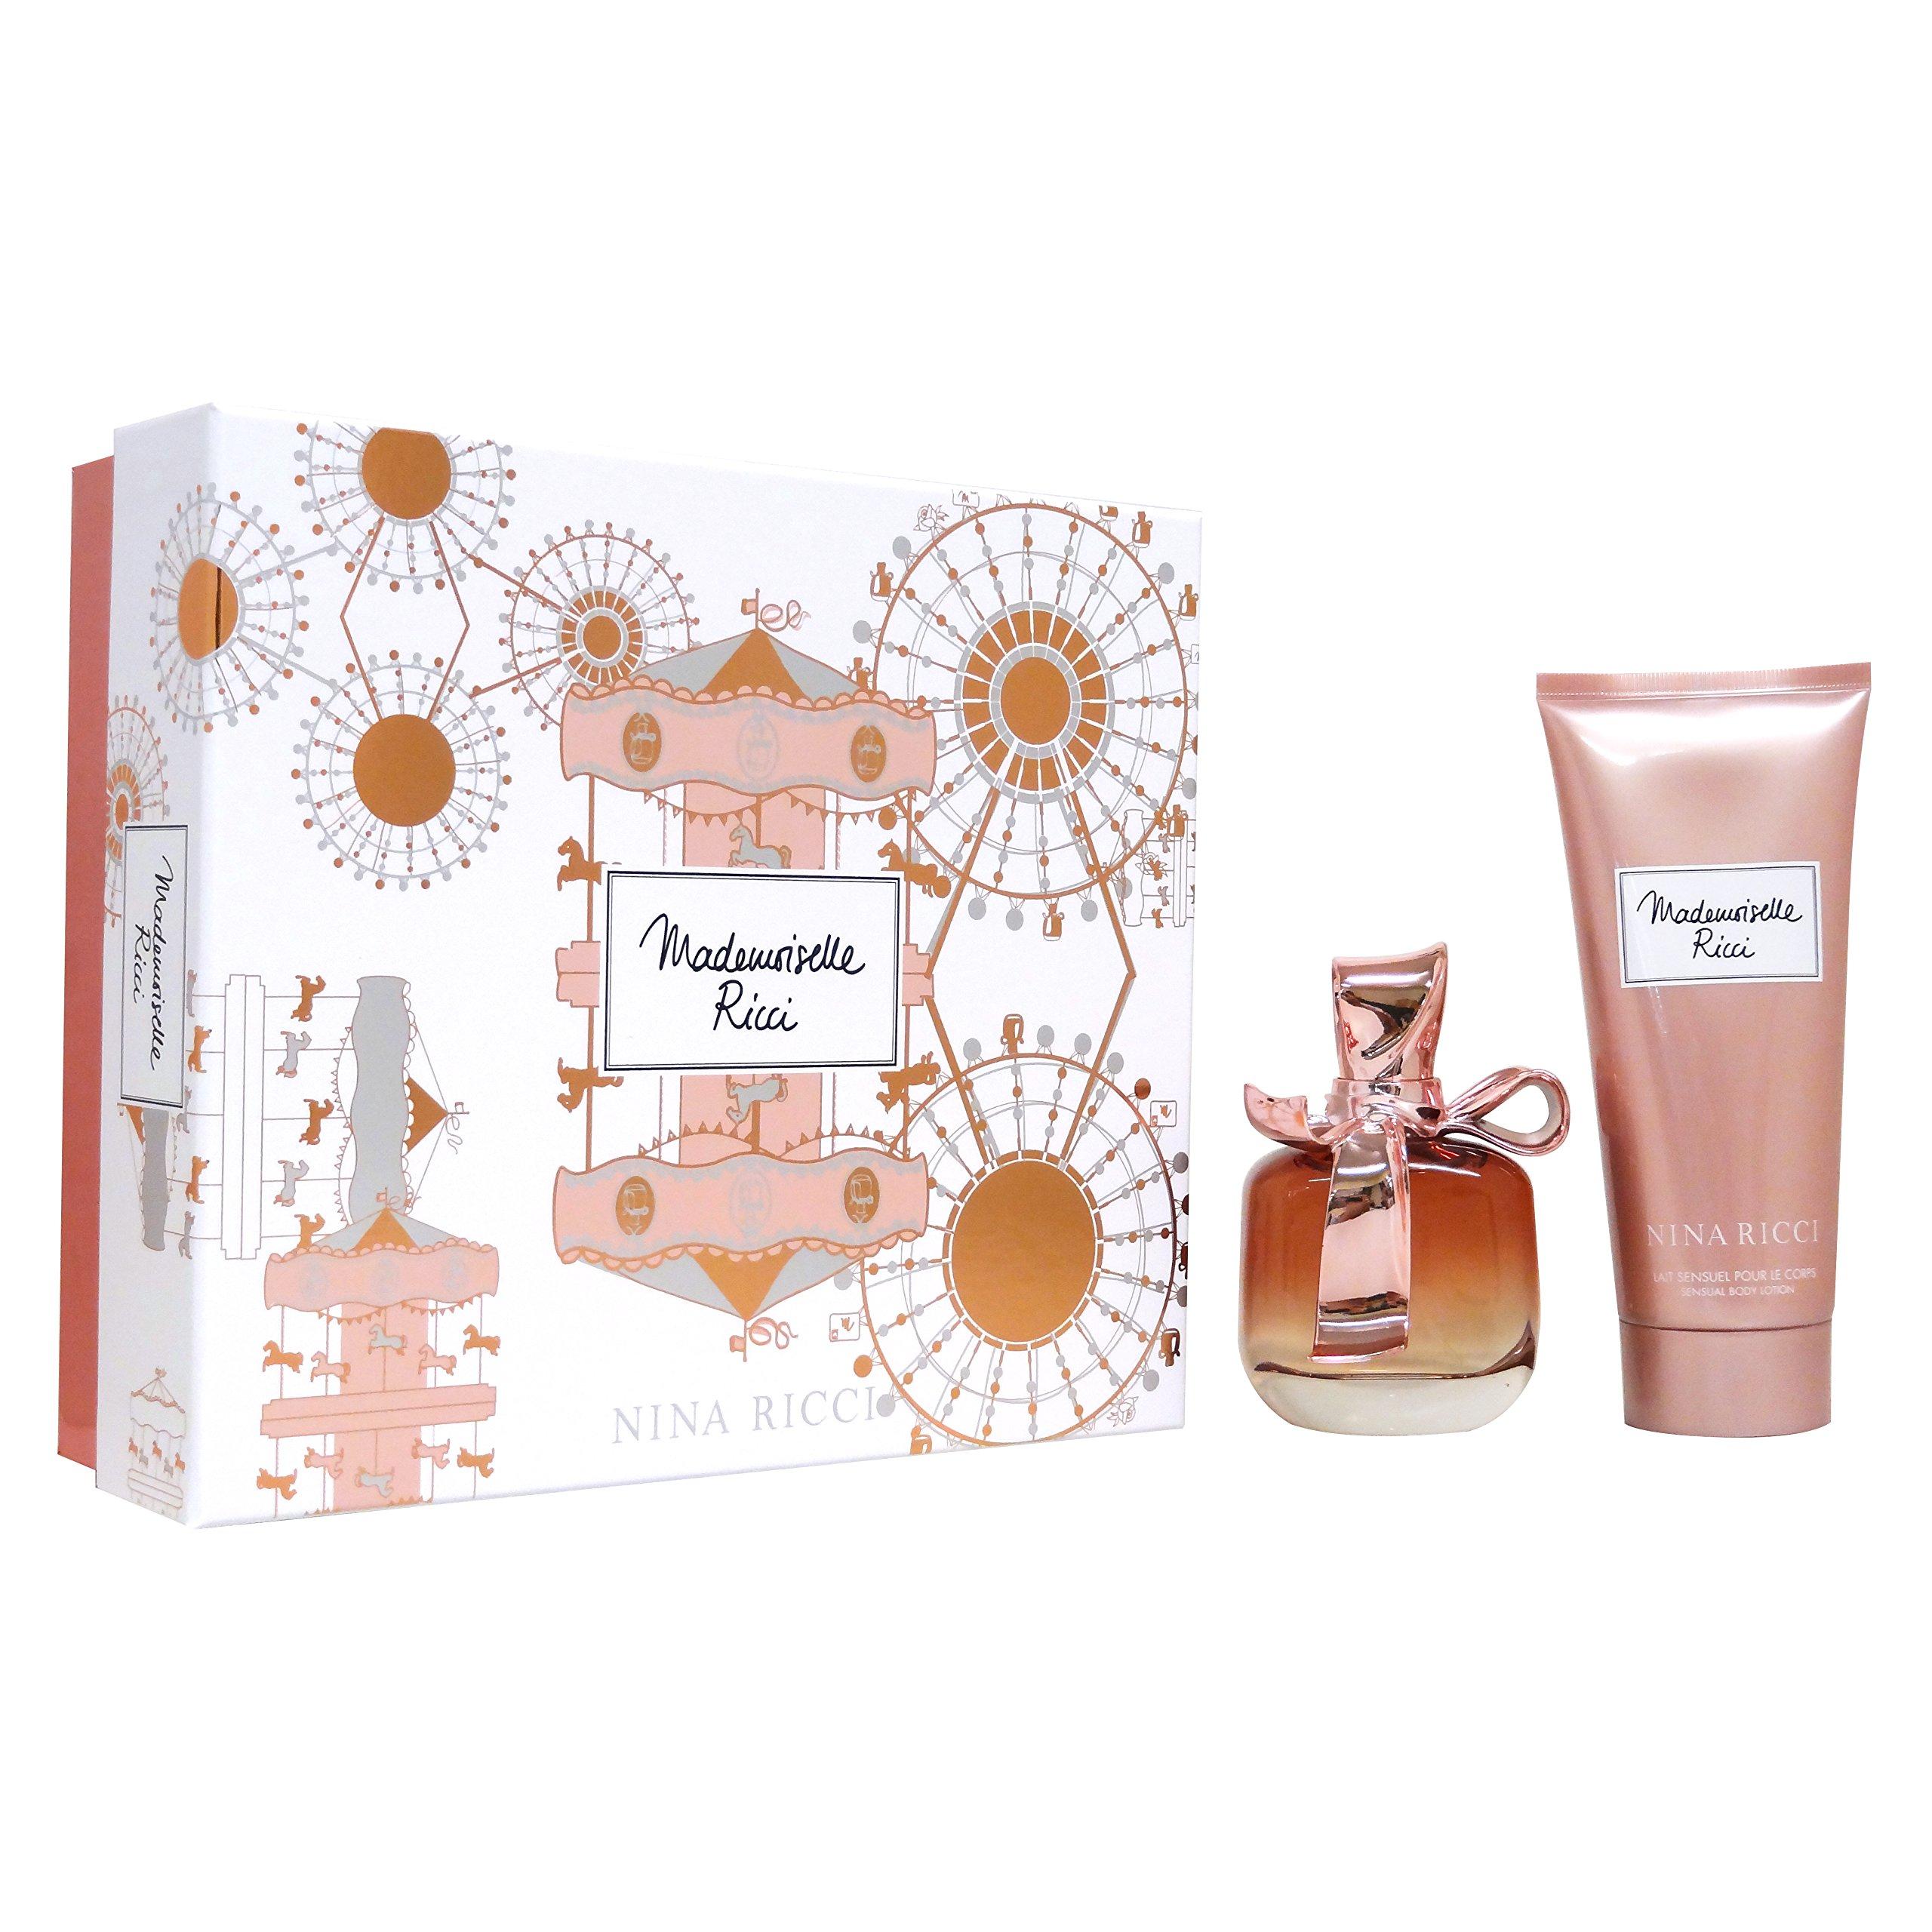 Nina Ricci Mademoiselle Ricci Gift Set 2.7oz (80ml) EDP + 6.8oz (200ml) Sensual Body Lotion